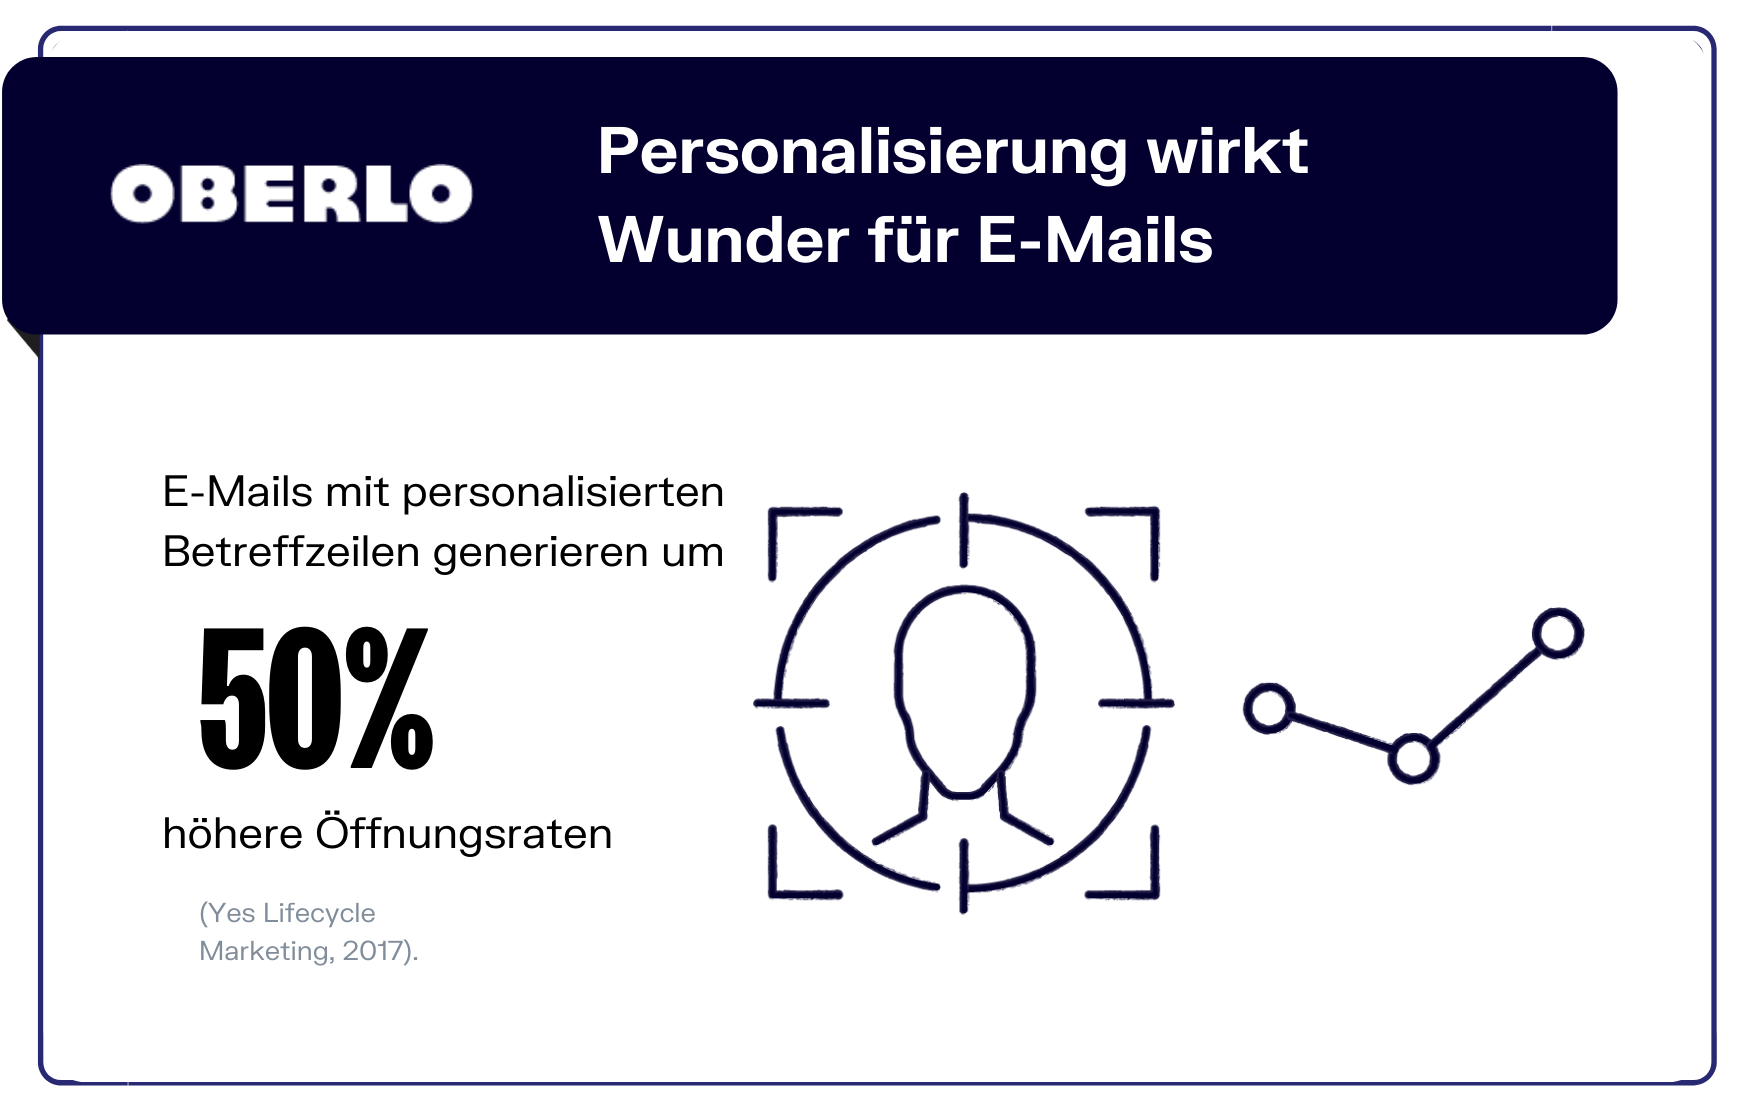 E-Mail-Marketing Statistik Personalisierung